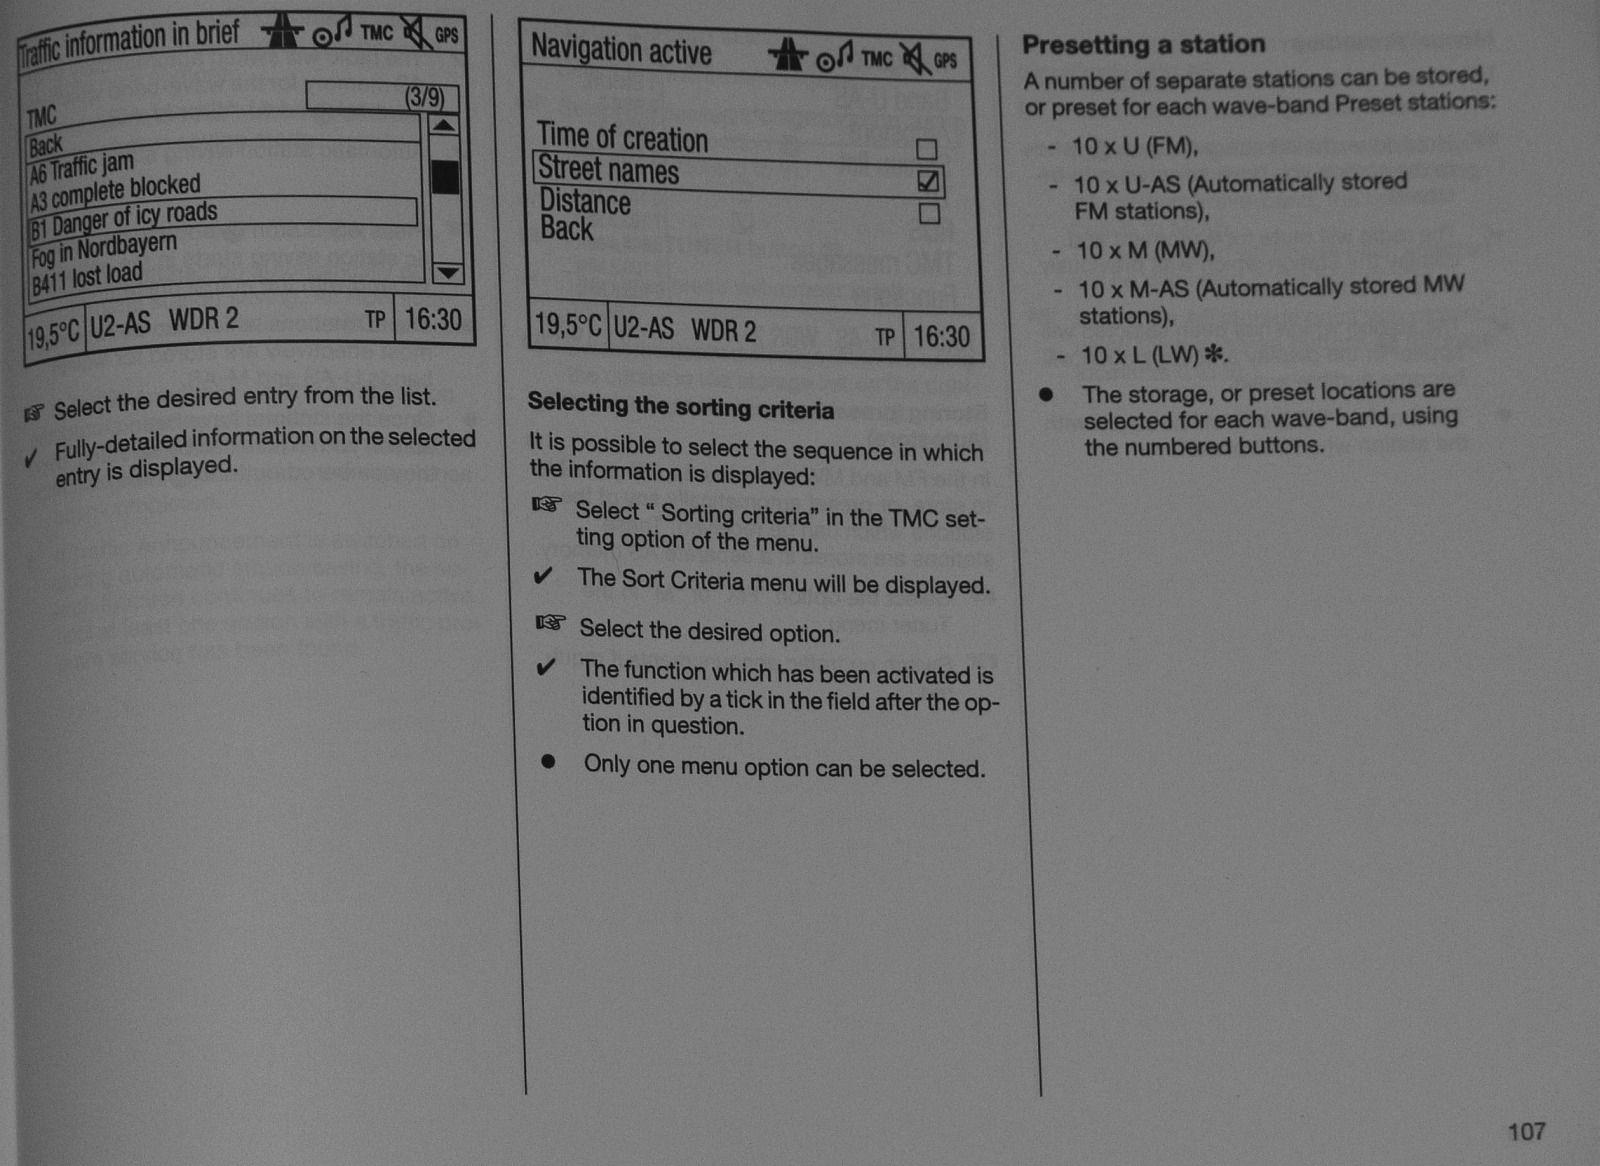 Zafira A 2.2 dti 125ch Design Edition Gris Lunaire [Babouni] - Page 14 Page1014